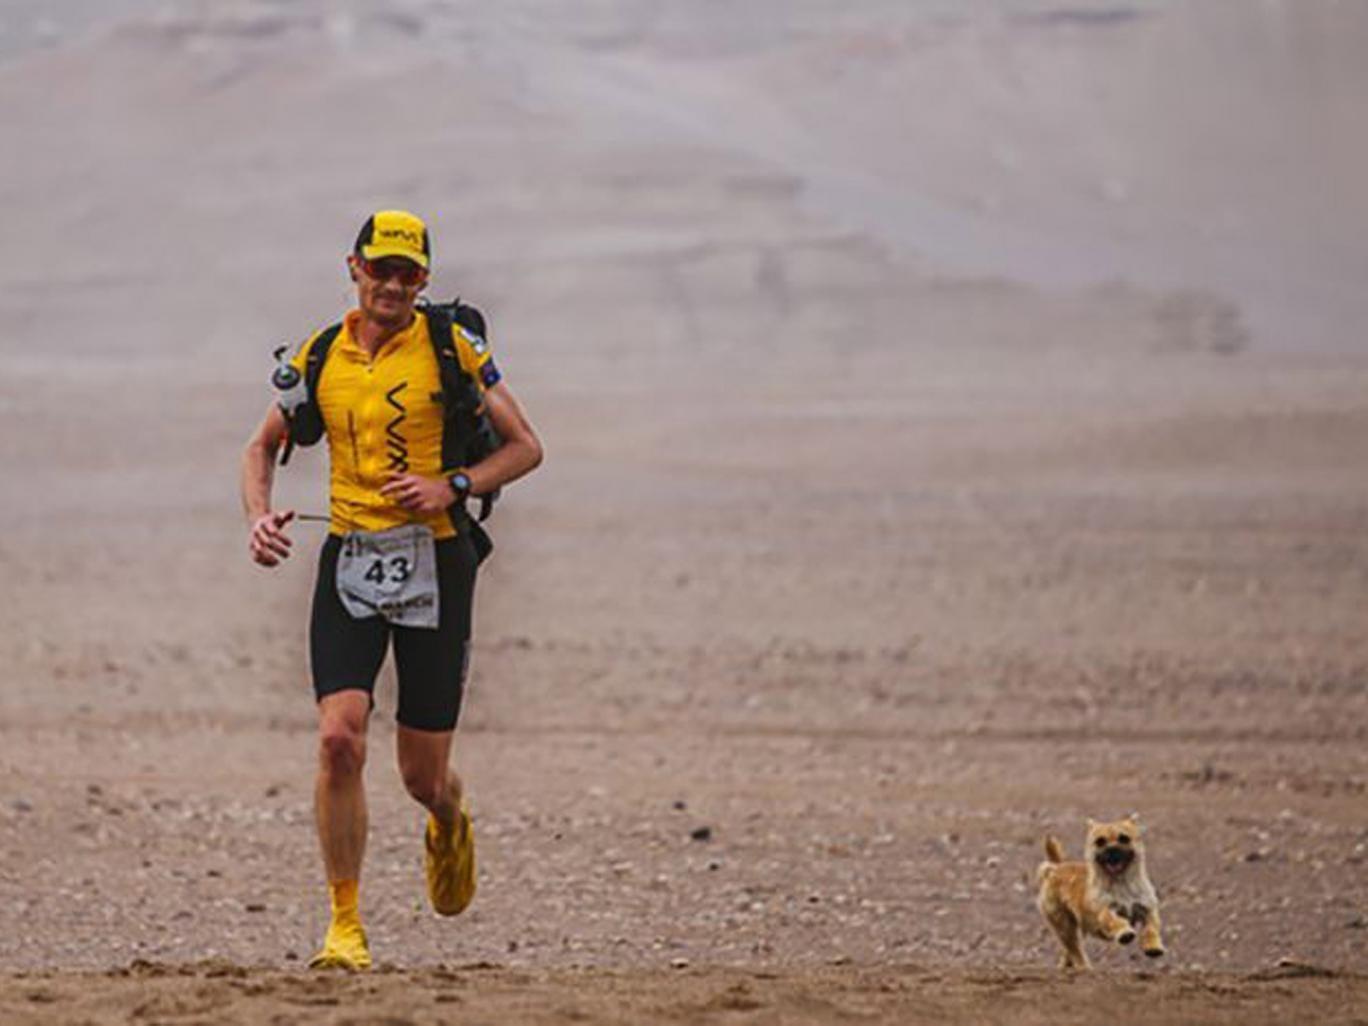 Ultramarathon runner Dion Leonard finally reunited with Gobi the dog after sharing 80-mile China desert trek Gobi-dog-4-deserts-pa